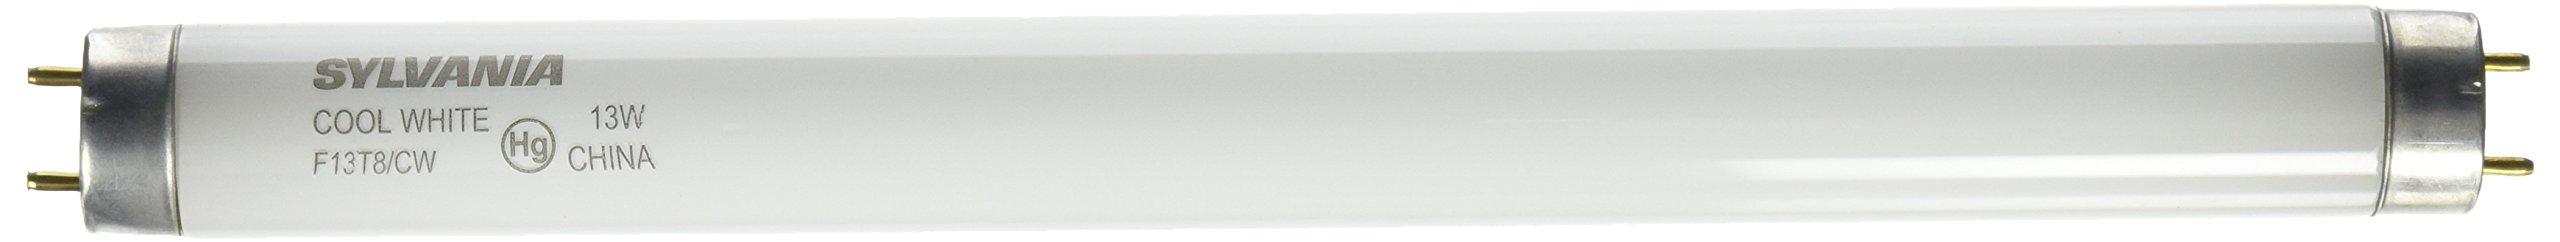 Sylvania 21766 - F13T8/CW Straight T8 Fluorescent Tube Light Bulb